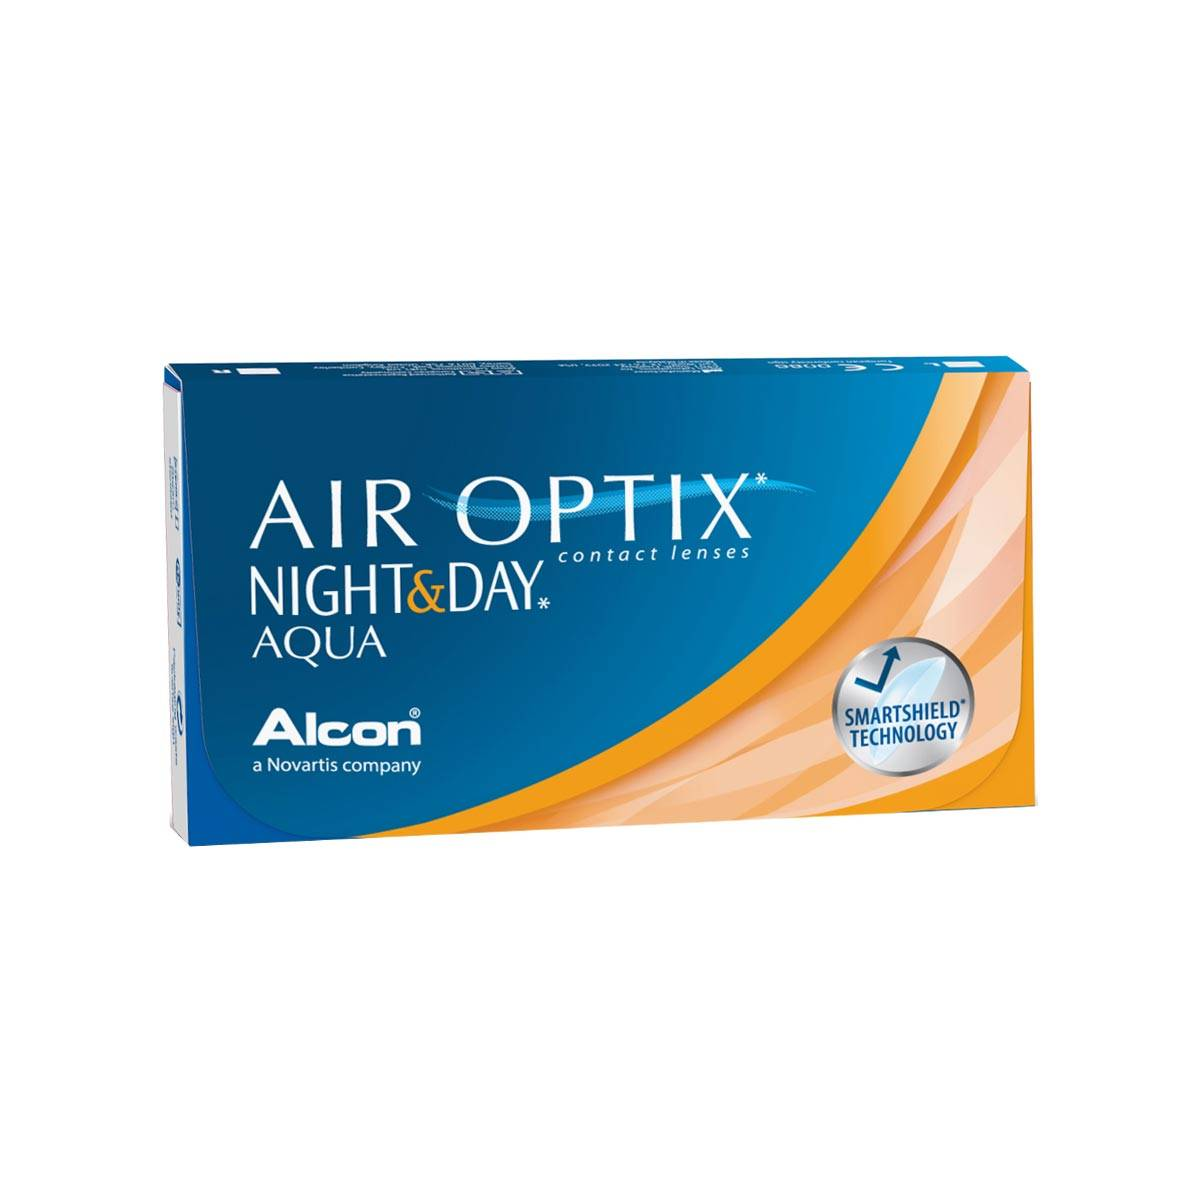 Alcon Air Optix Night & Day Aqua -2.50 mensuelles 6 lentilles de contact Alcon -2.50 Lotrafilcon B I 5 (Silicone Hydrogel)